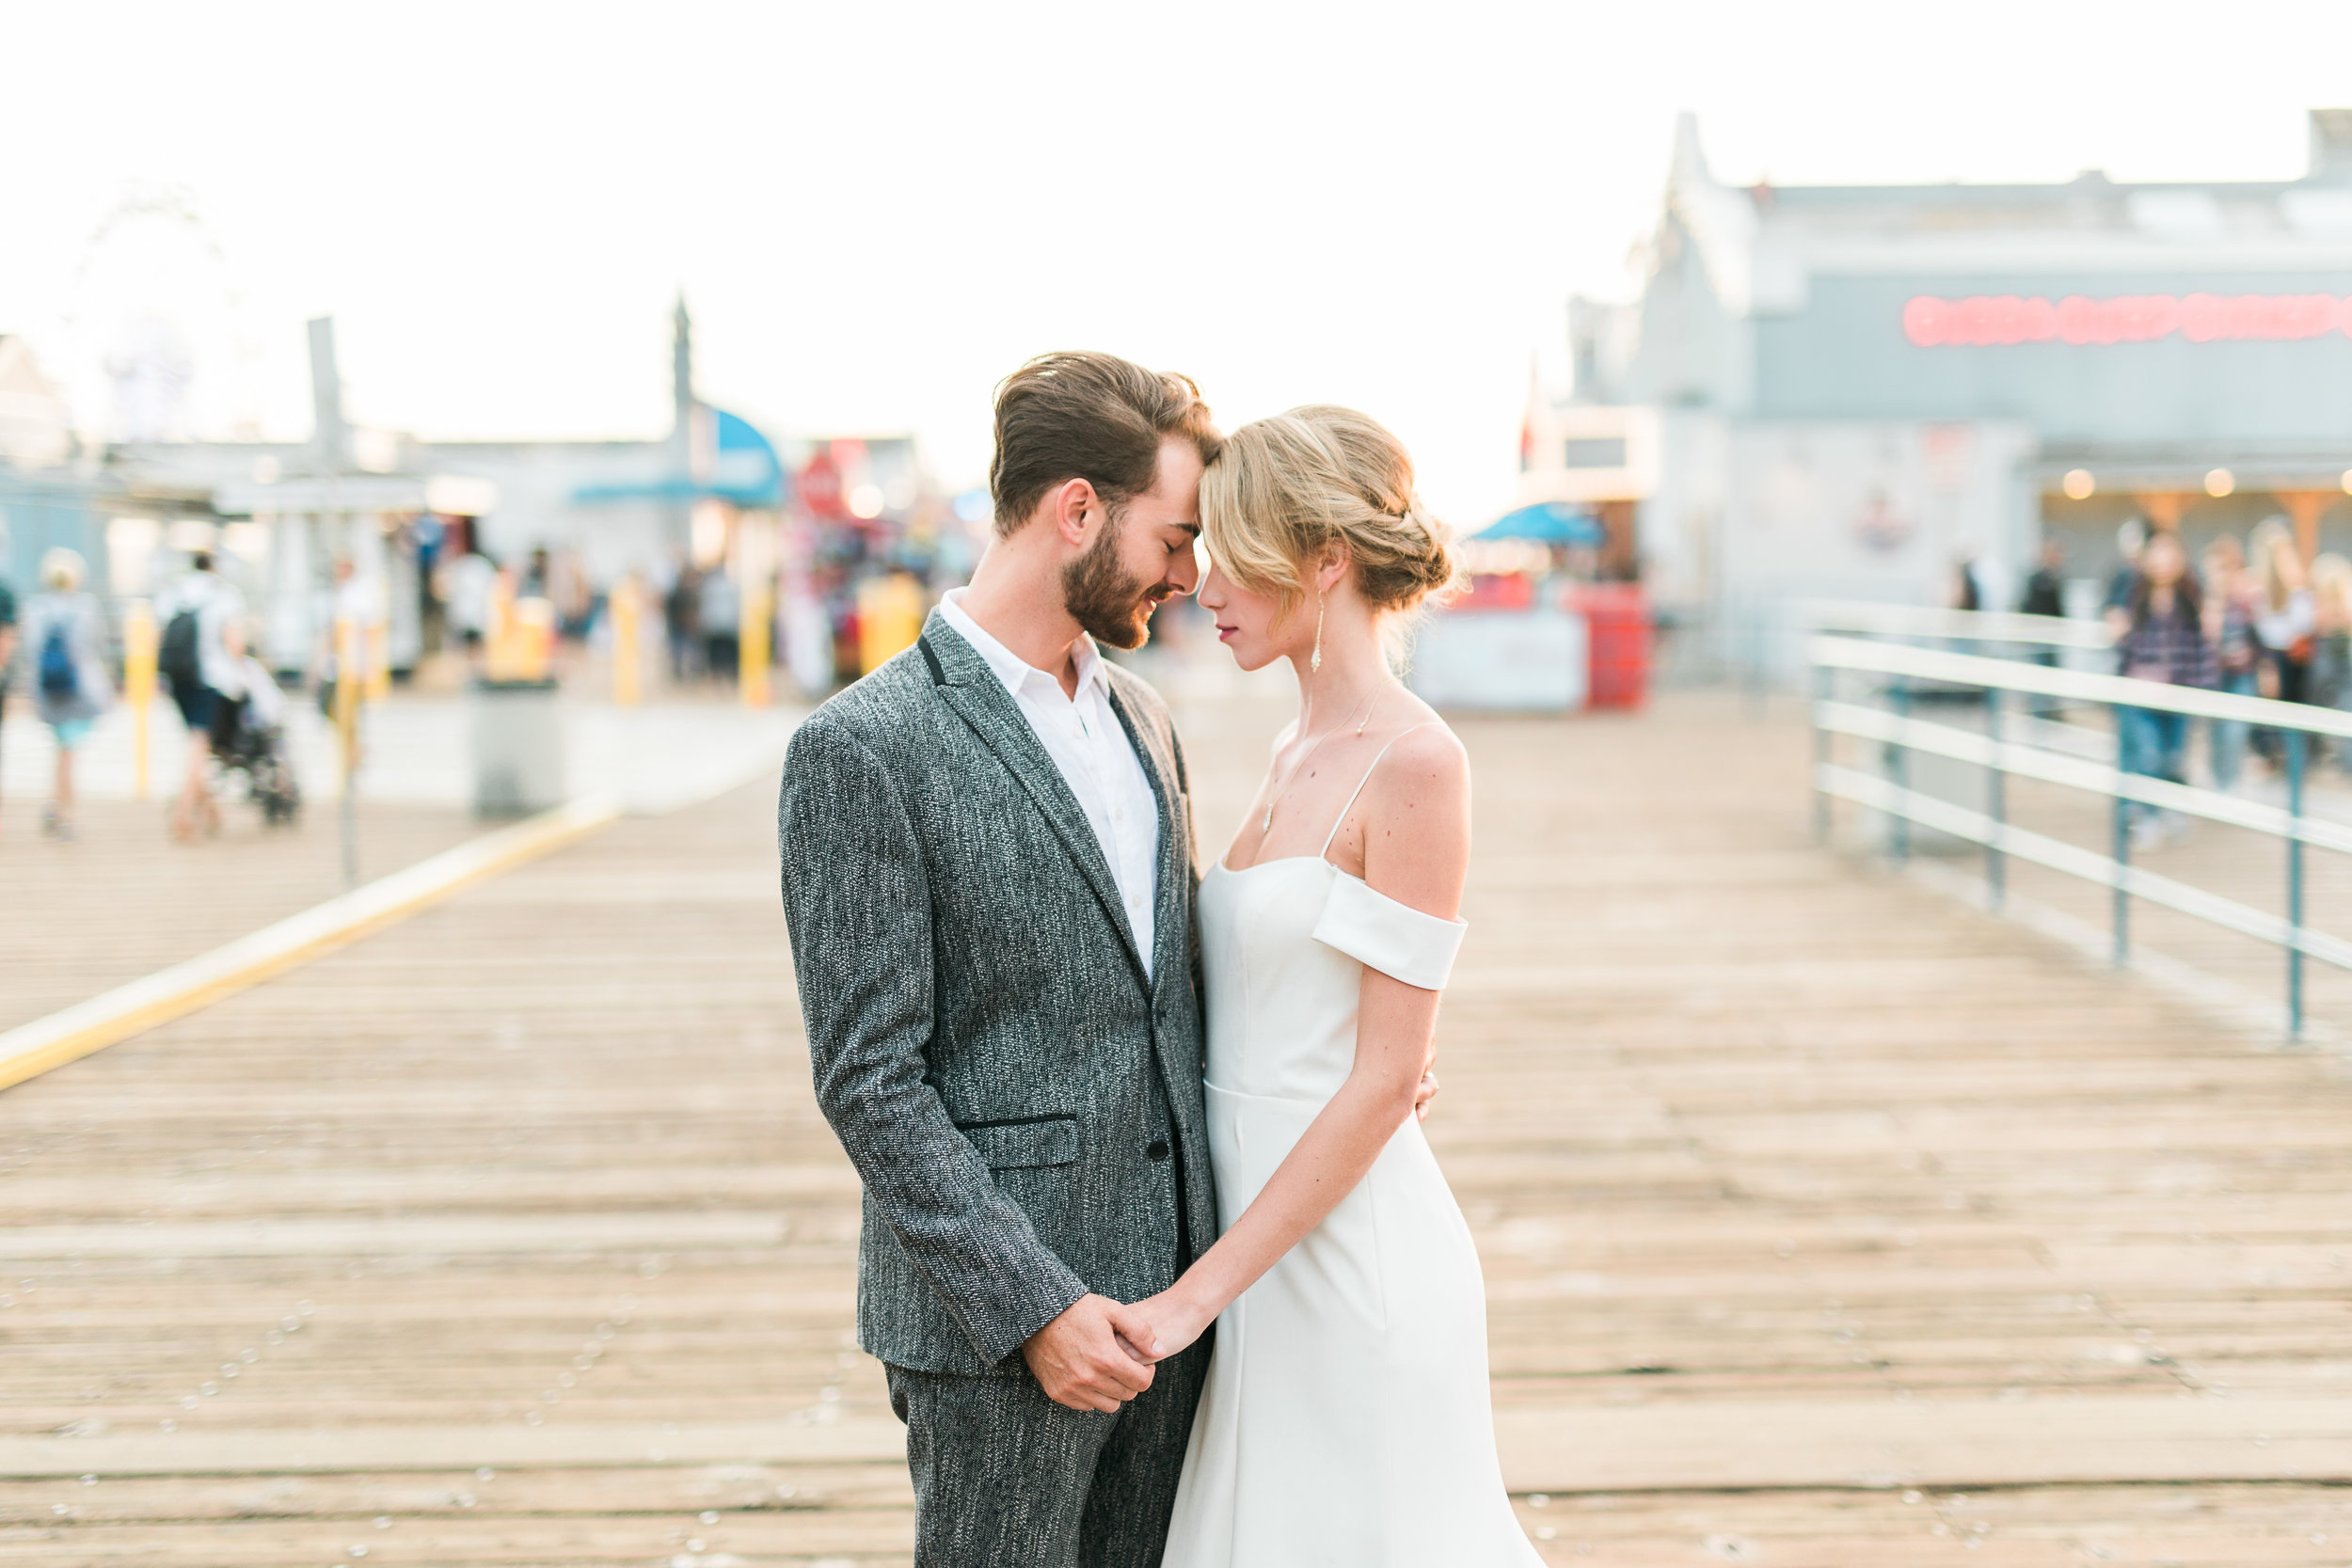 LA-Wedding-Shoot-by-JBJ-Pictures-140.jpg